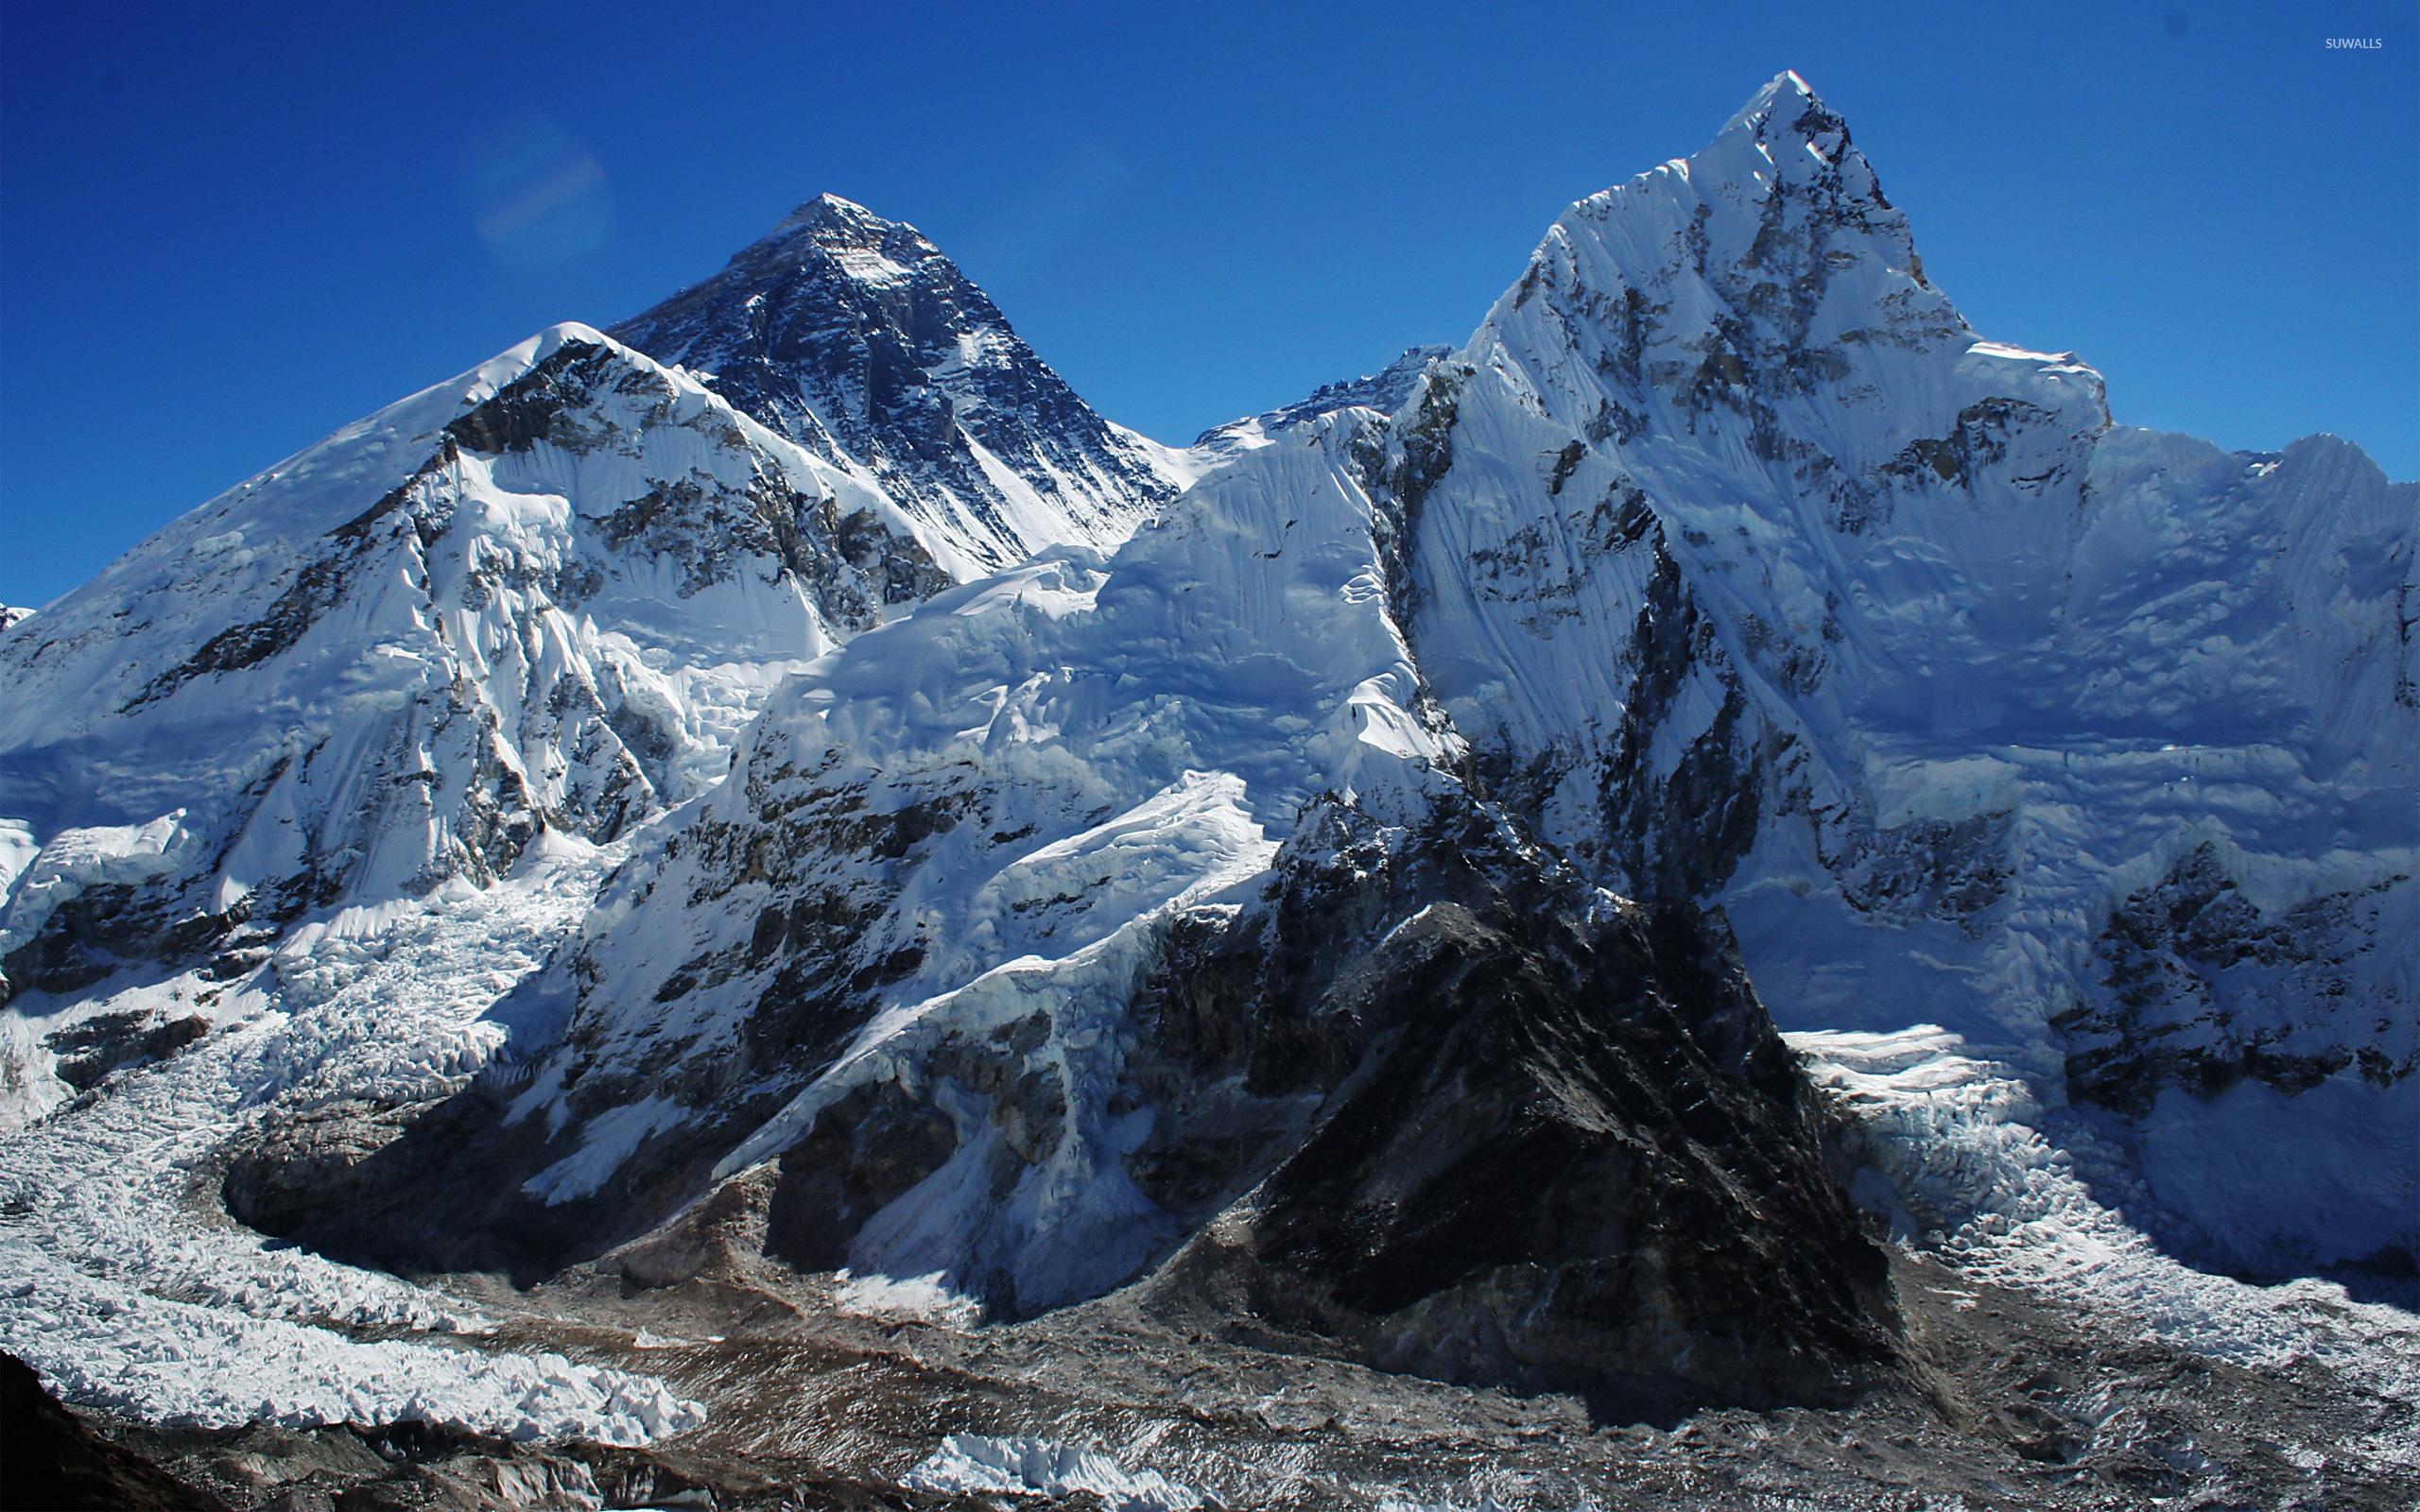 Mount Everest Wallpaper Nature Wallpapers 8066